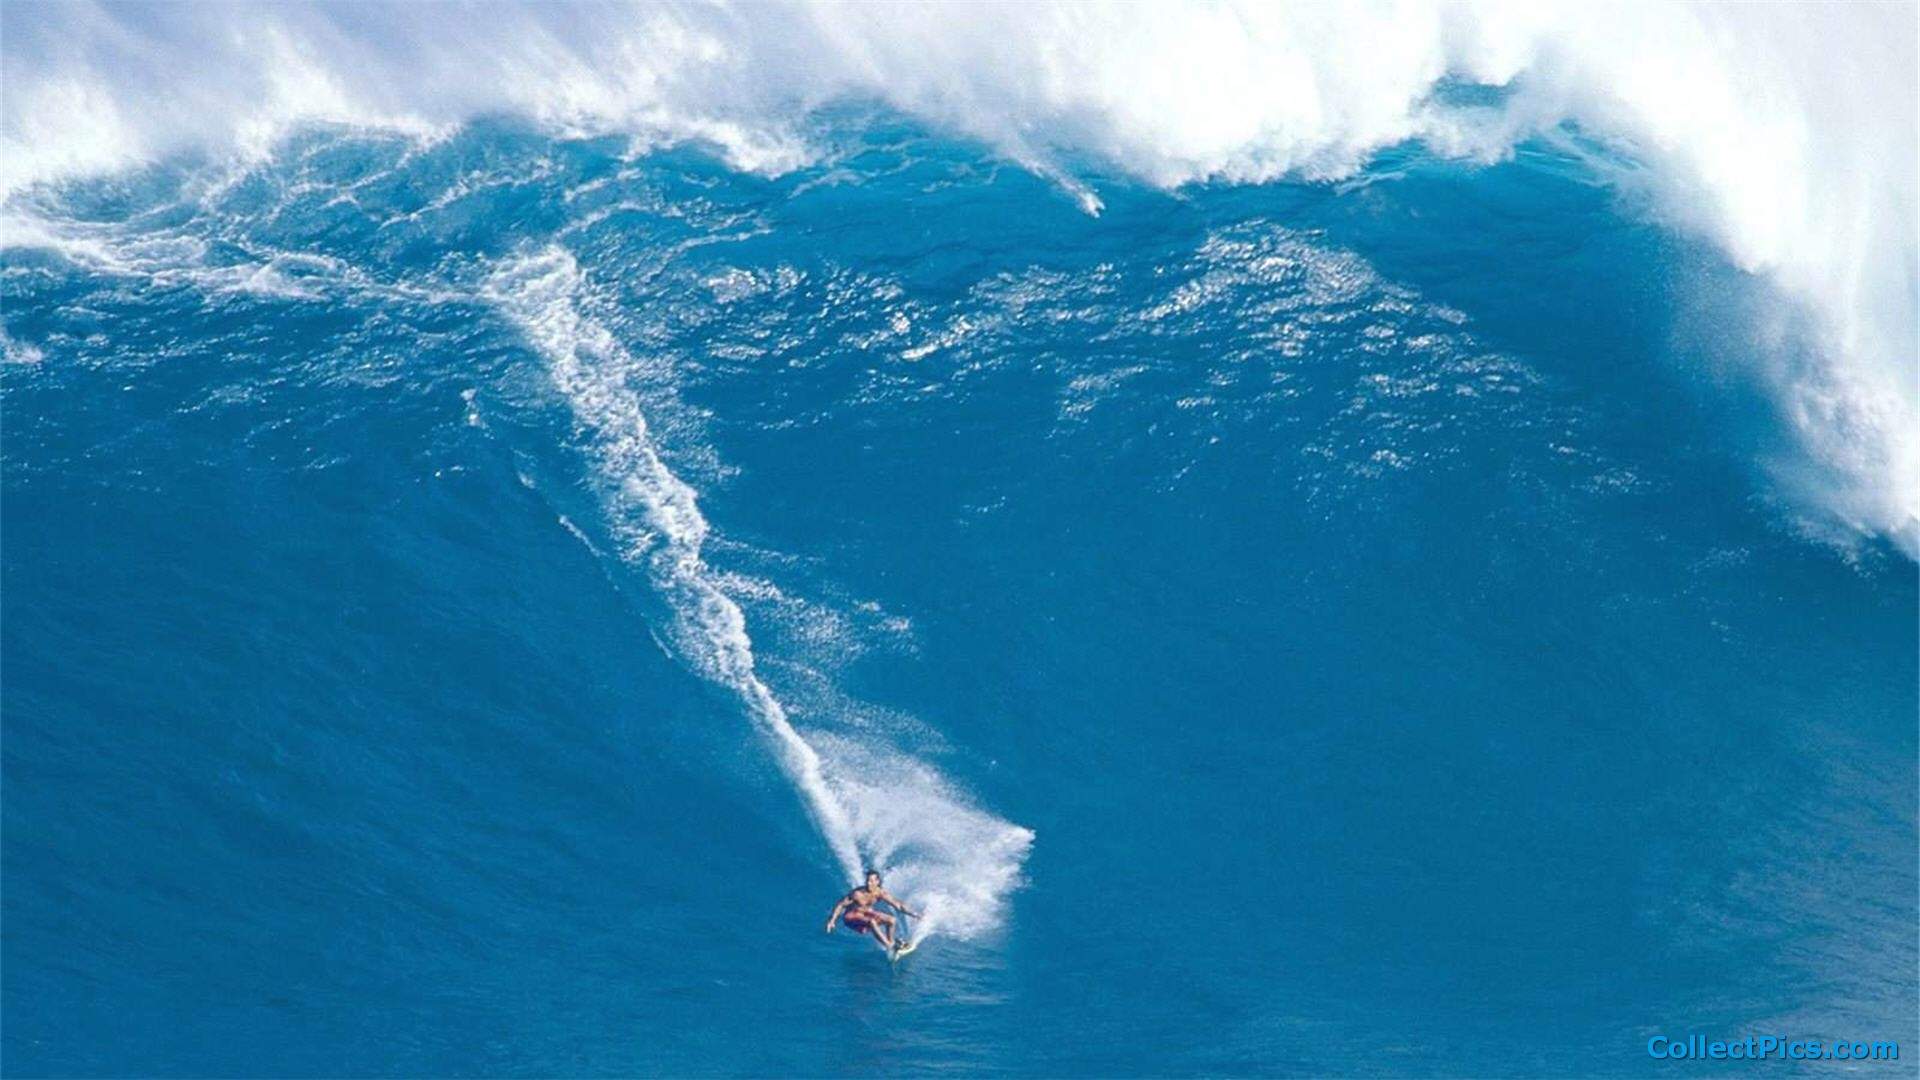 Surfing Download Wallpaper HD 1920x1080 5019 1920x1080